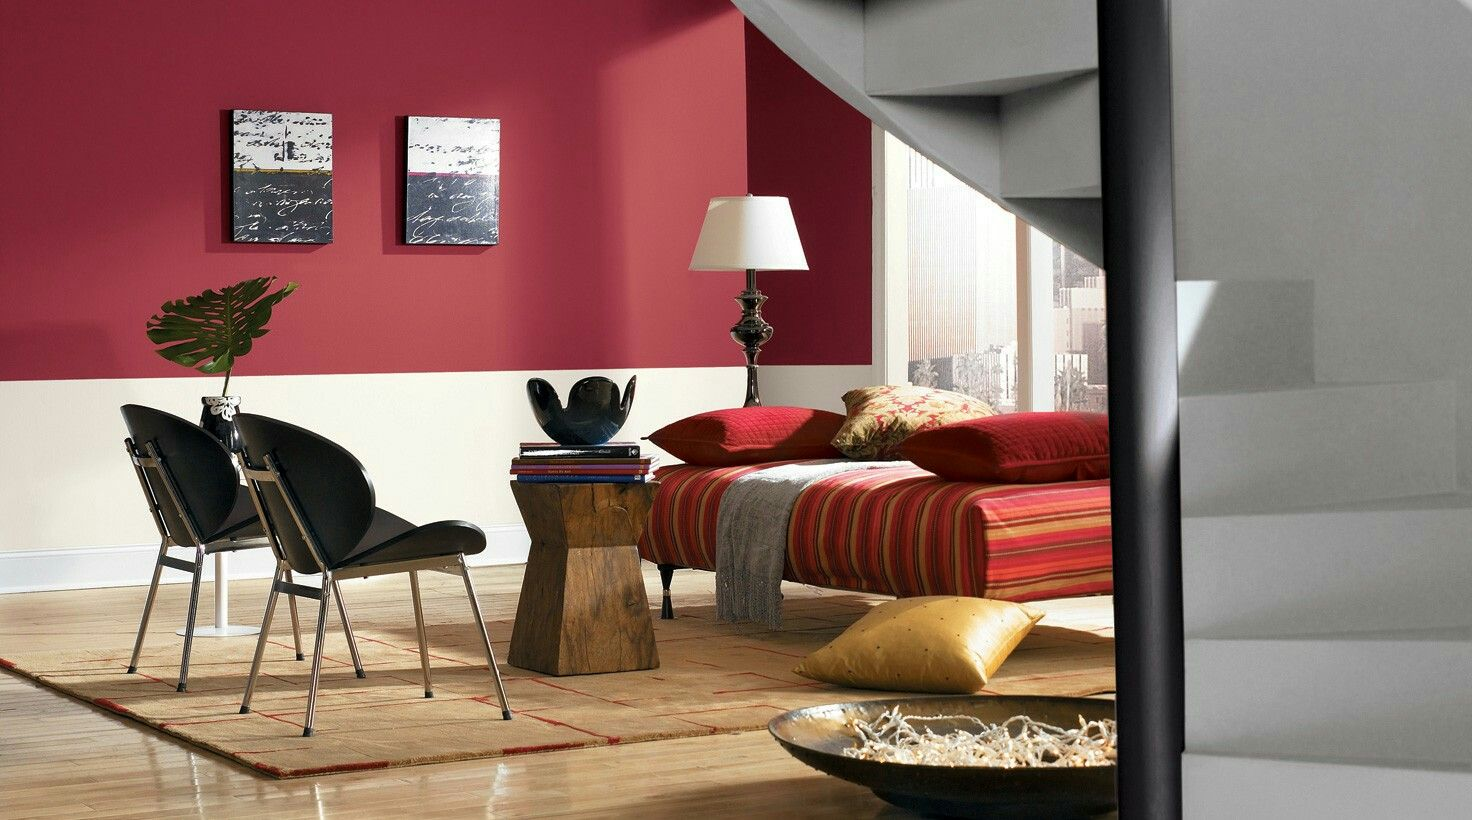 Pin by A. Diaz Thompson on Interior paint ideas | Modern ...